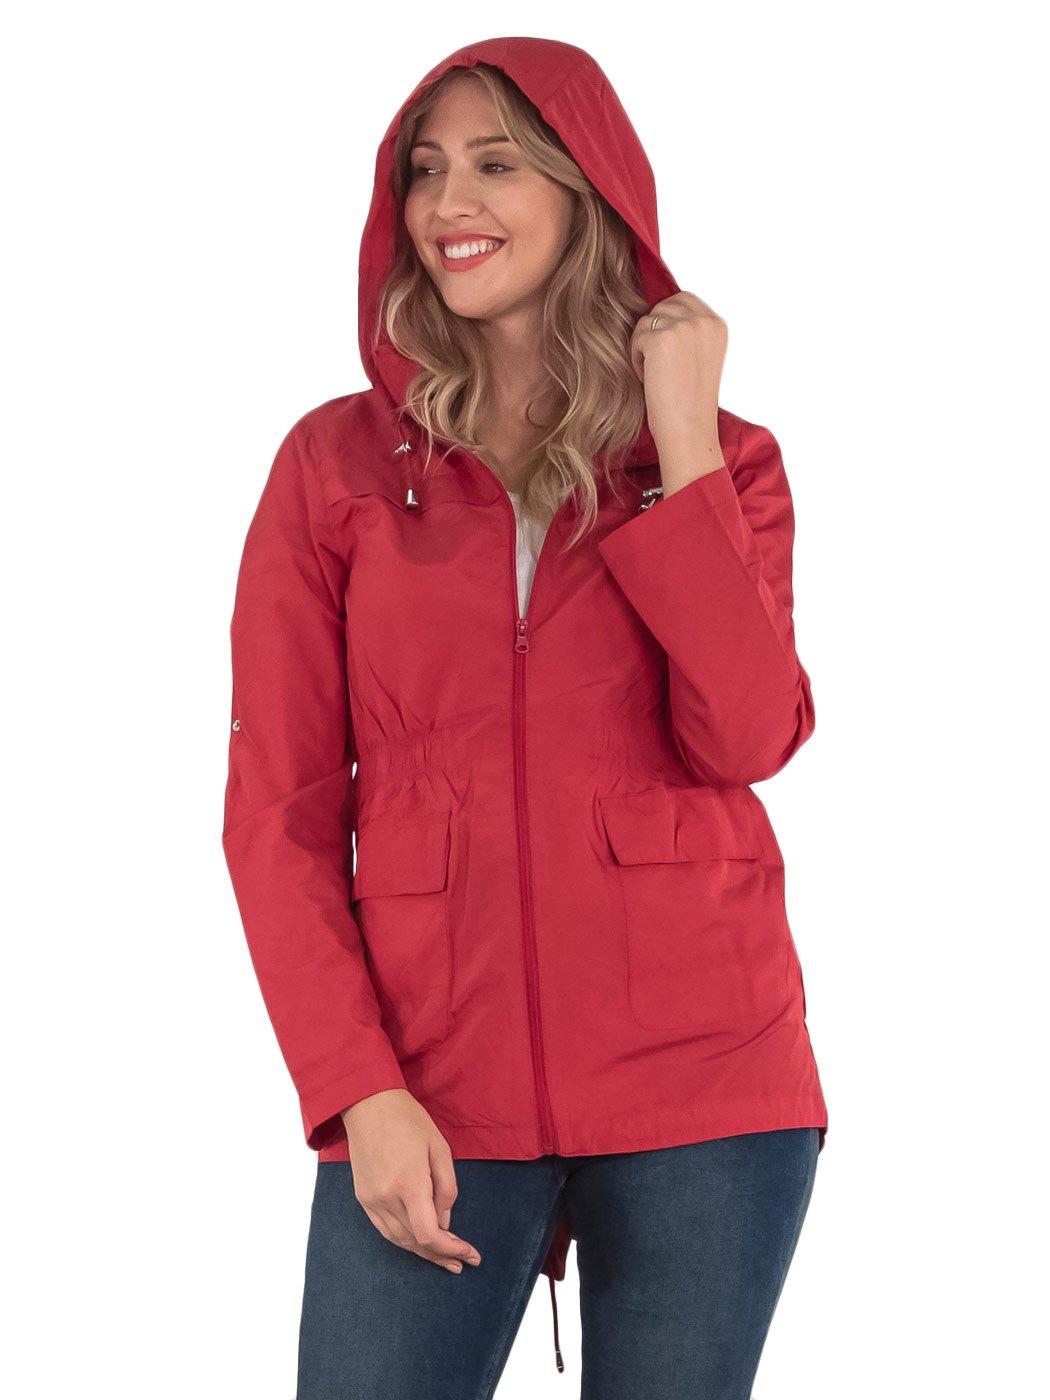 Womens-RainCoat-Plain-Hooded-Ladies-Jacket-Kagool-Parka-Long-Sleeves-Two-Pockets thumbnail 8